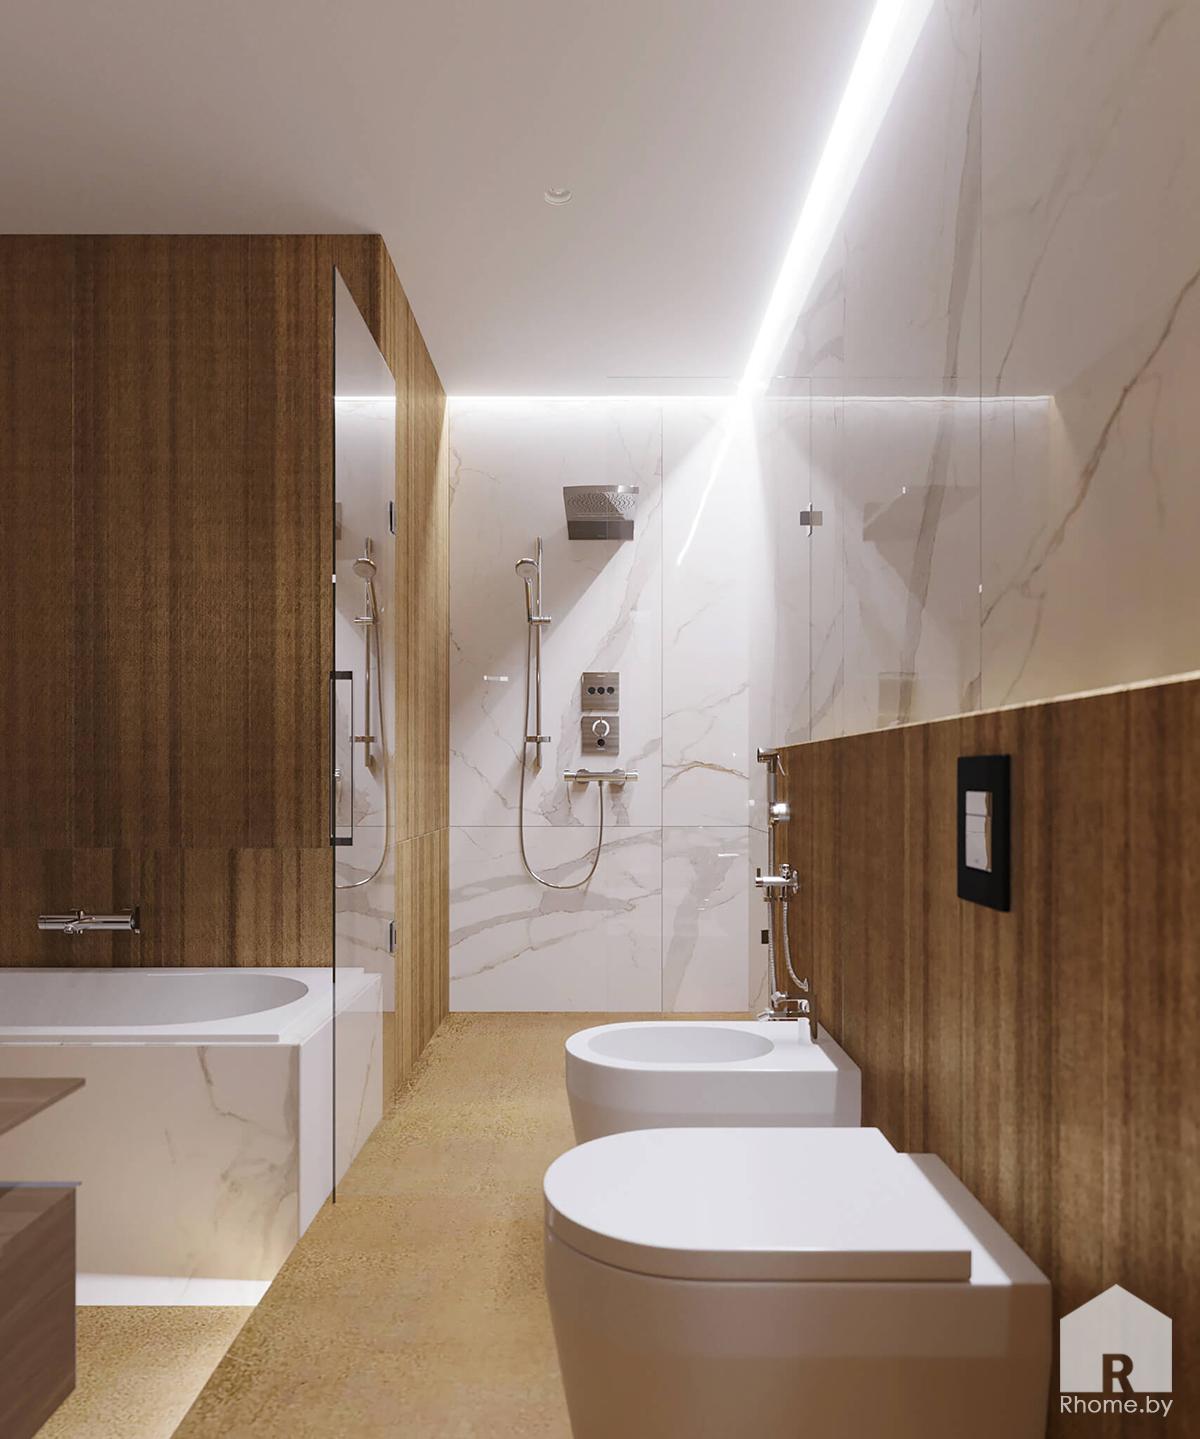 Санузел на втором этаже | Дизайн студия – Rhome.by